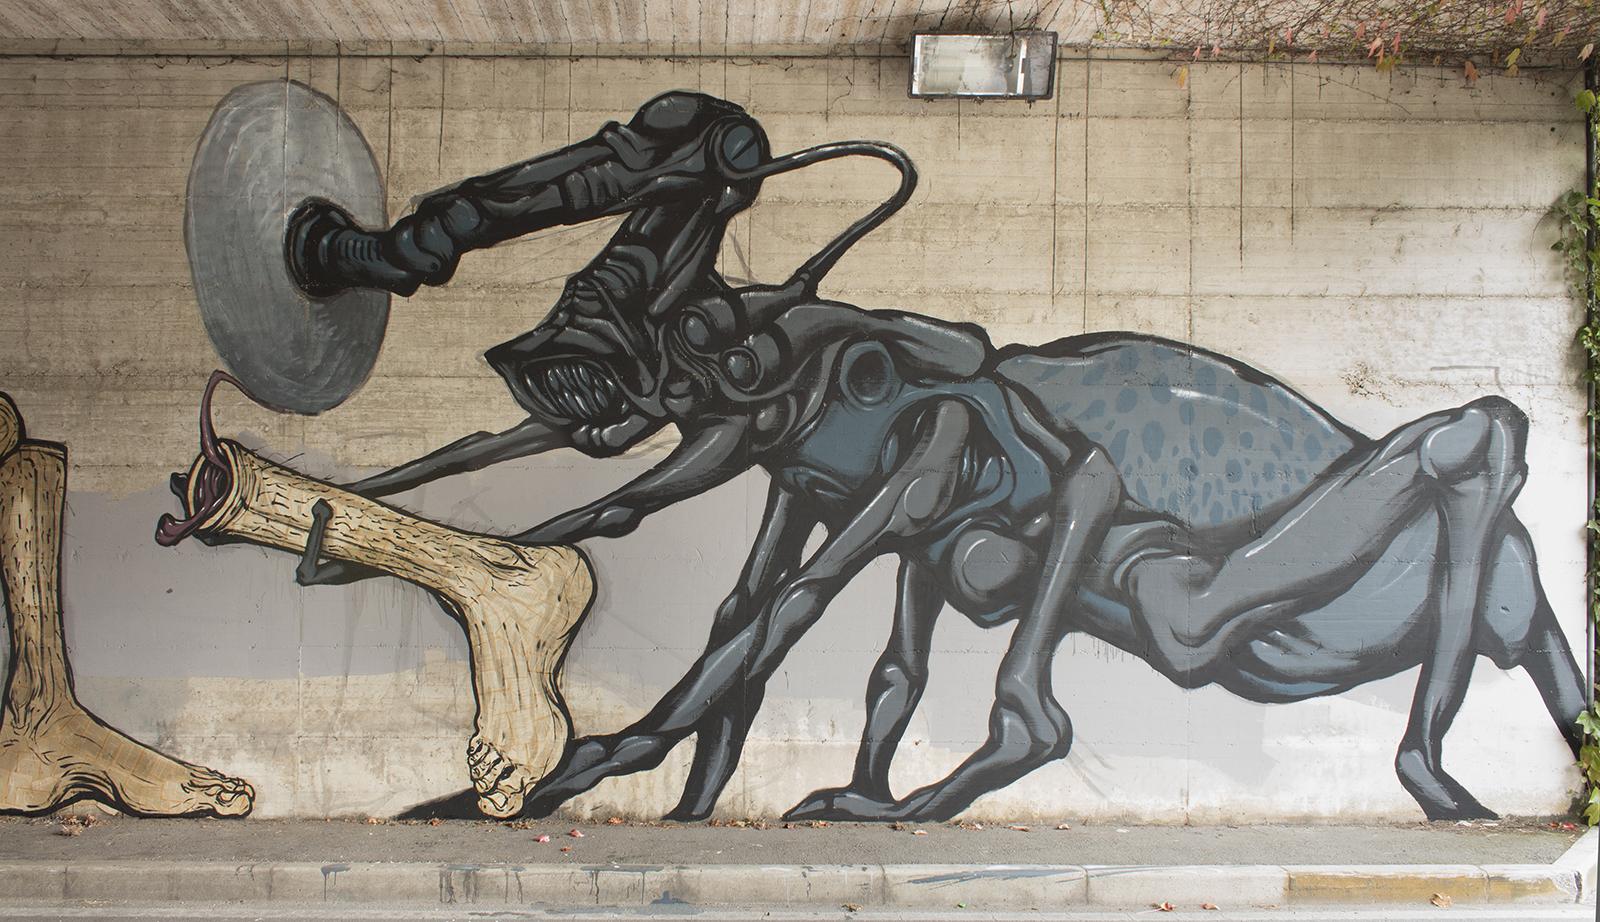 nemos-dissensocognitivo-natura-morta-mural-08